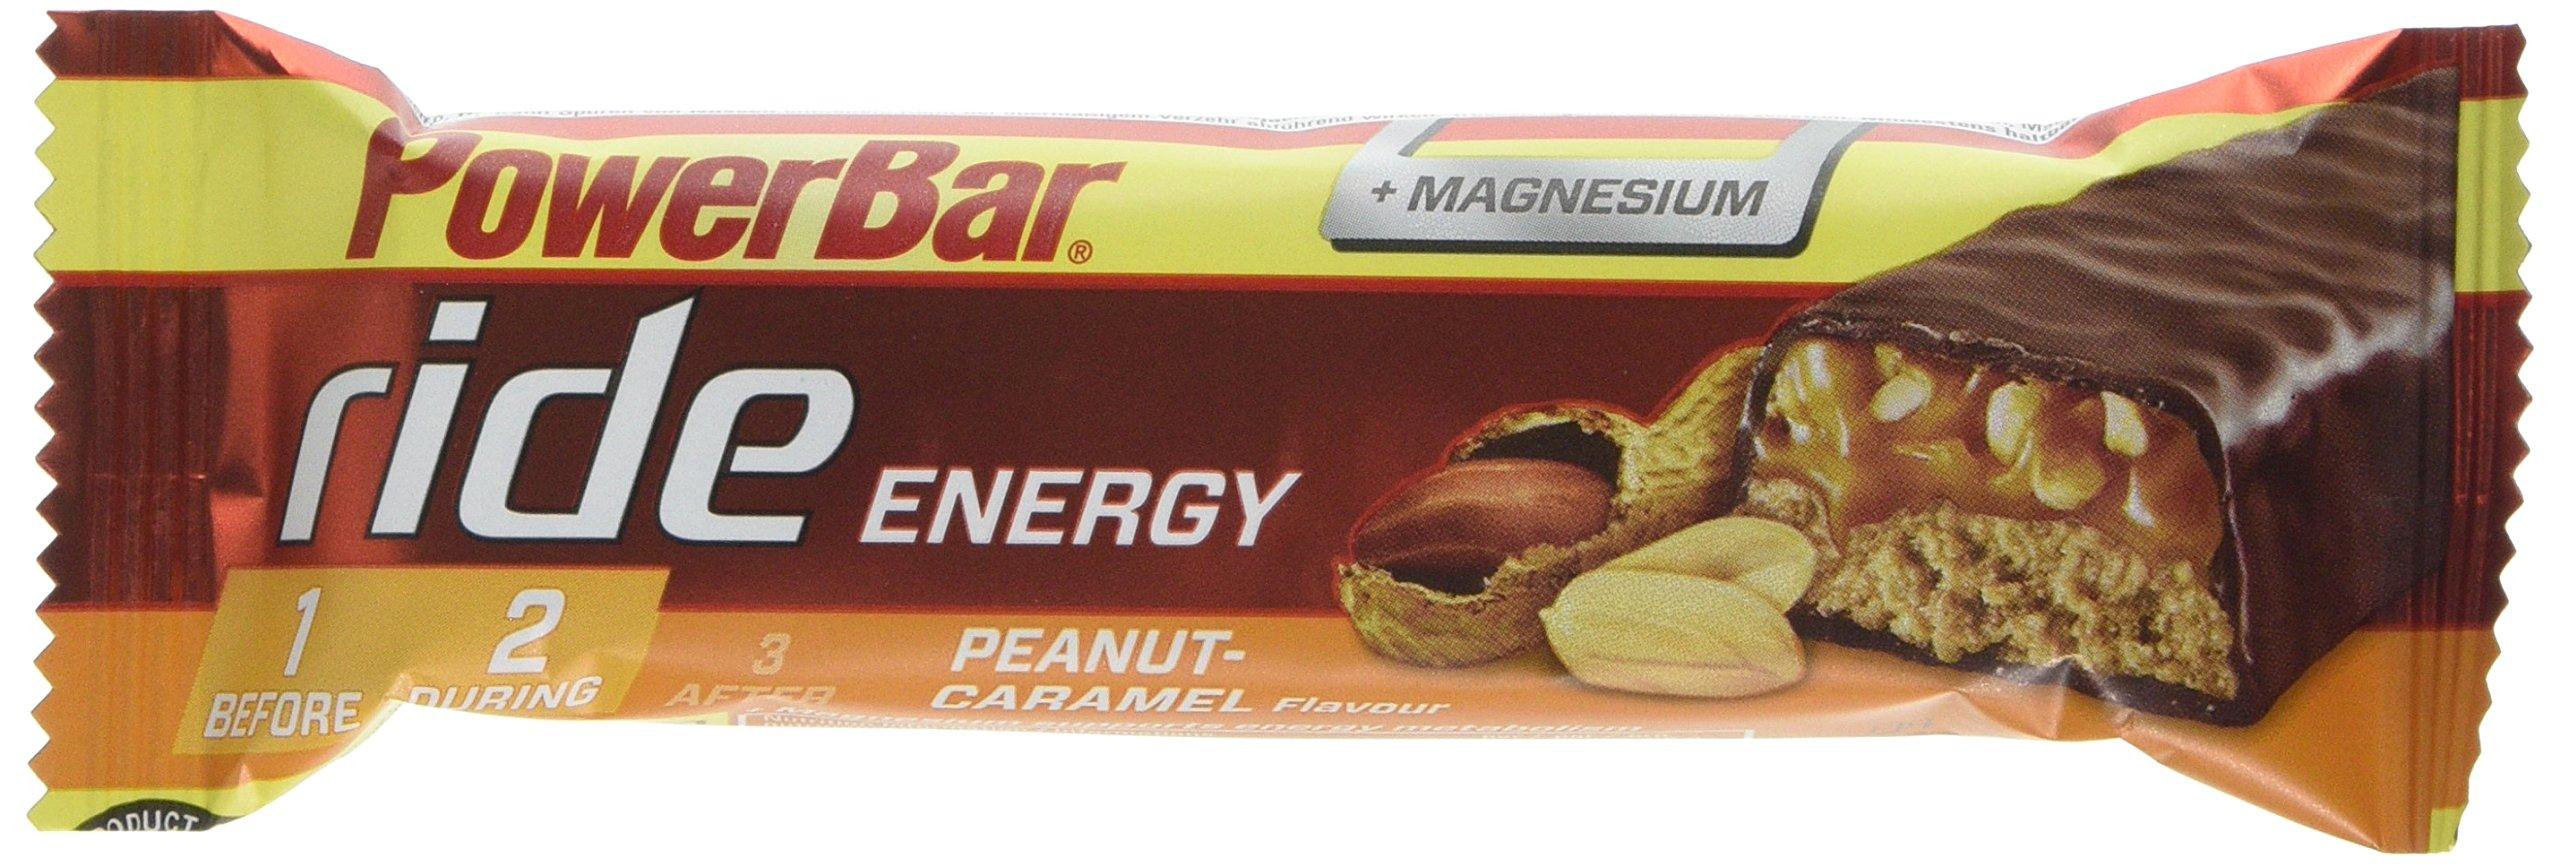 PowerBar Ride Energy Bar with Magnesium - Chocolate Peanut Ride - 18x55g product image